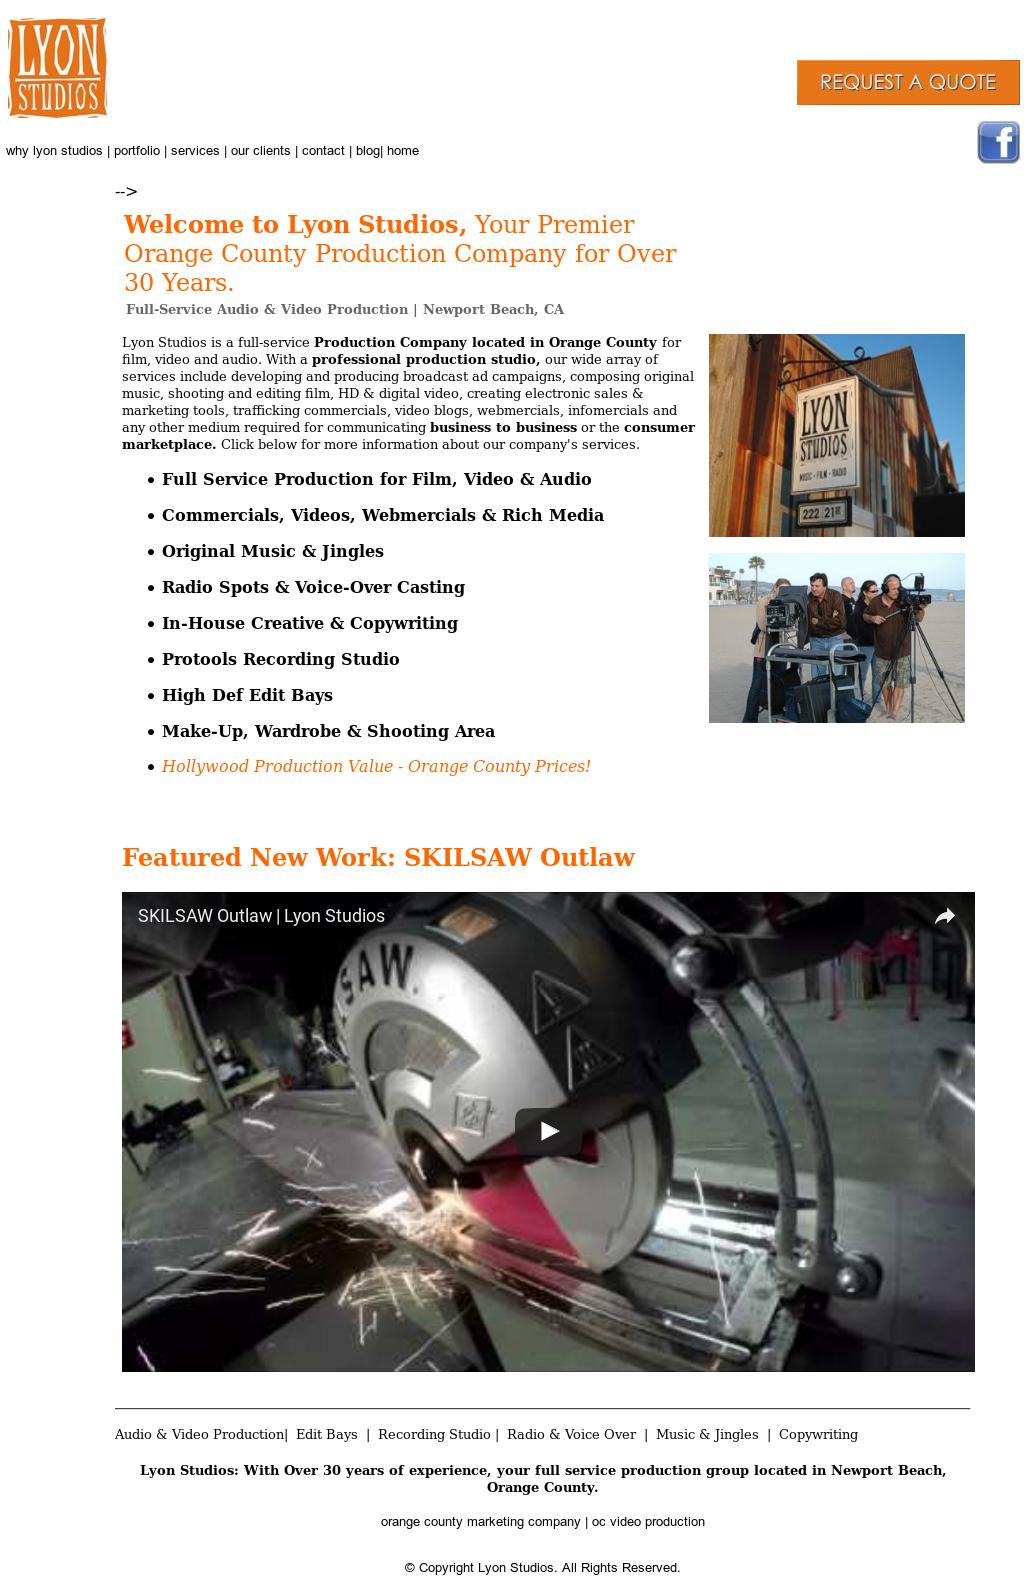 Lyon Studios Competitors, Revenue and Employees - Owler